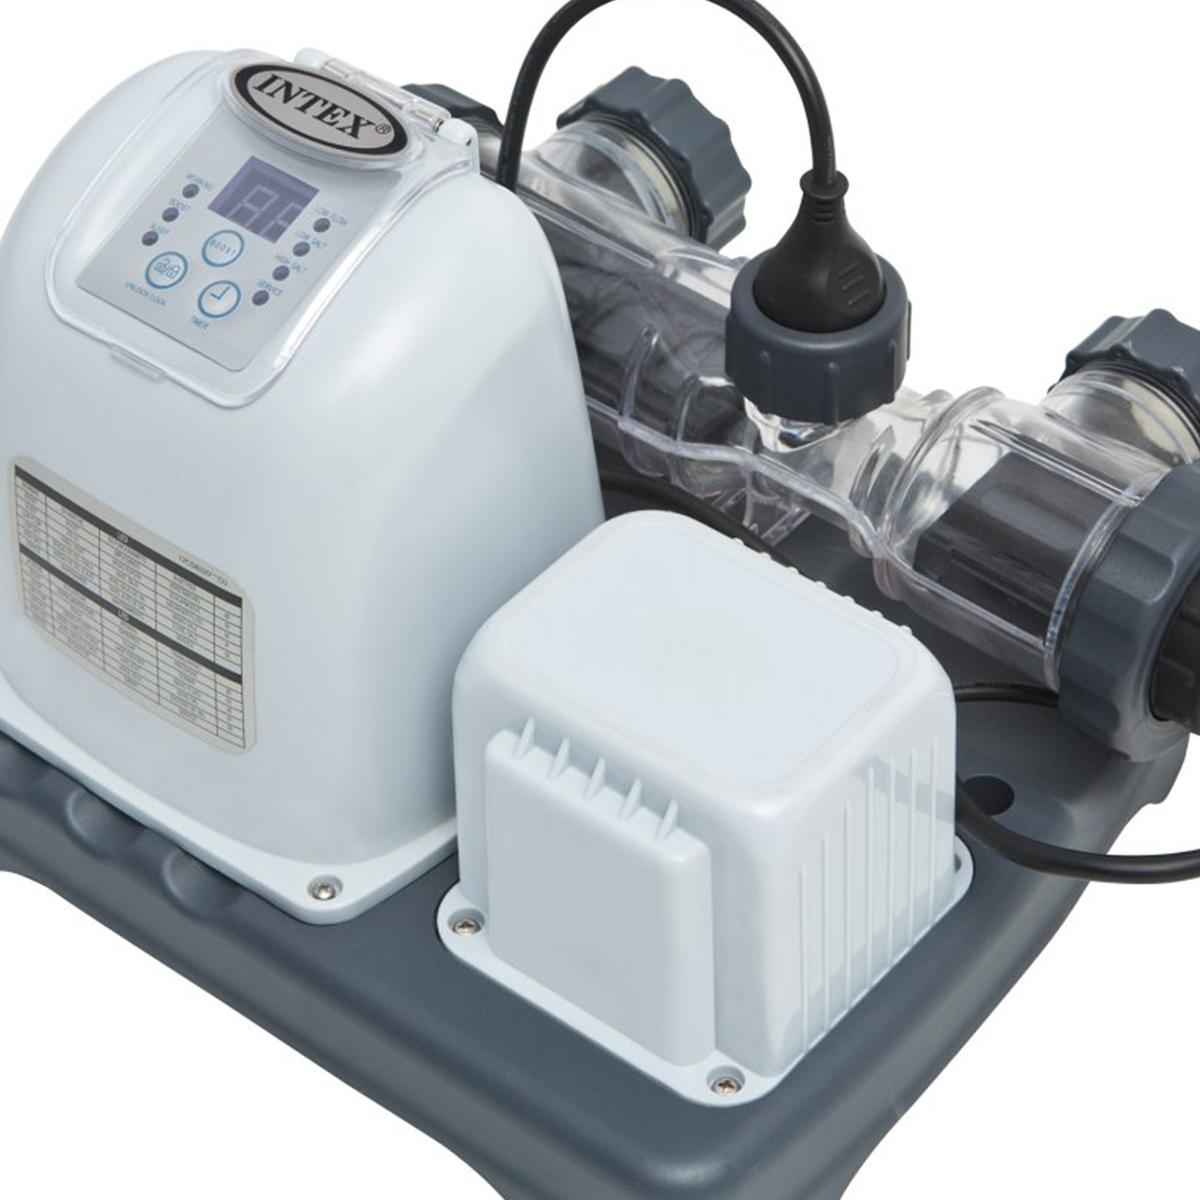 Intex Krystal Clear Saltwater System Above Ground Pool Chlorinator 28669eg Ebay